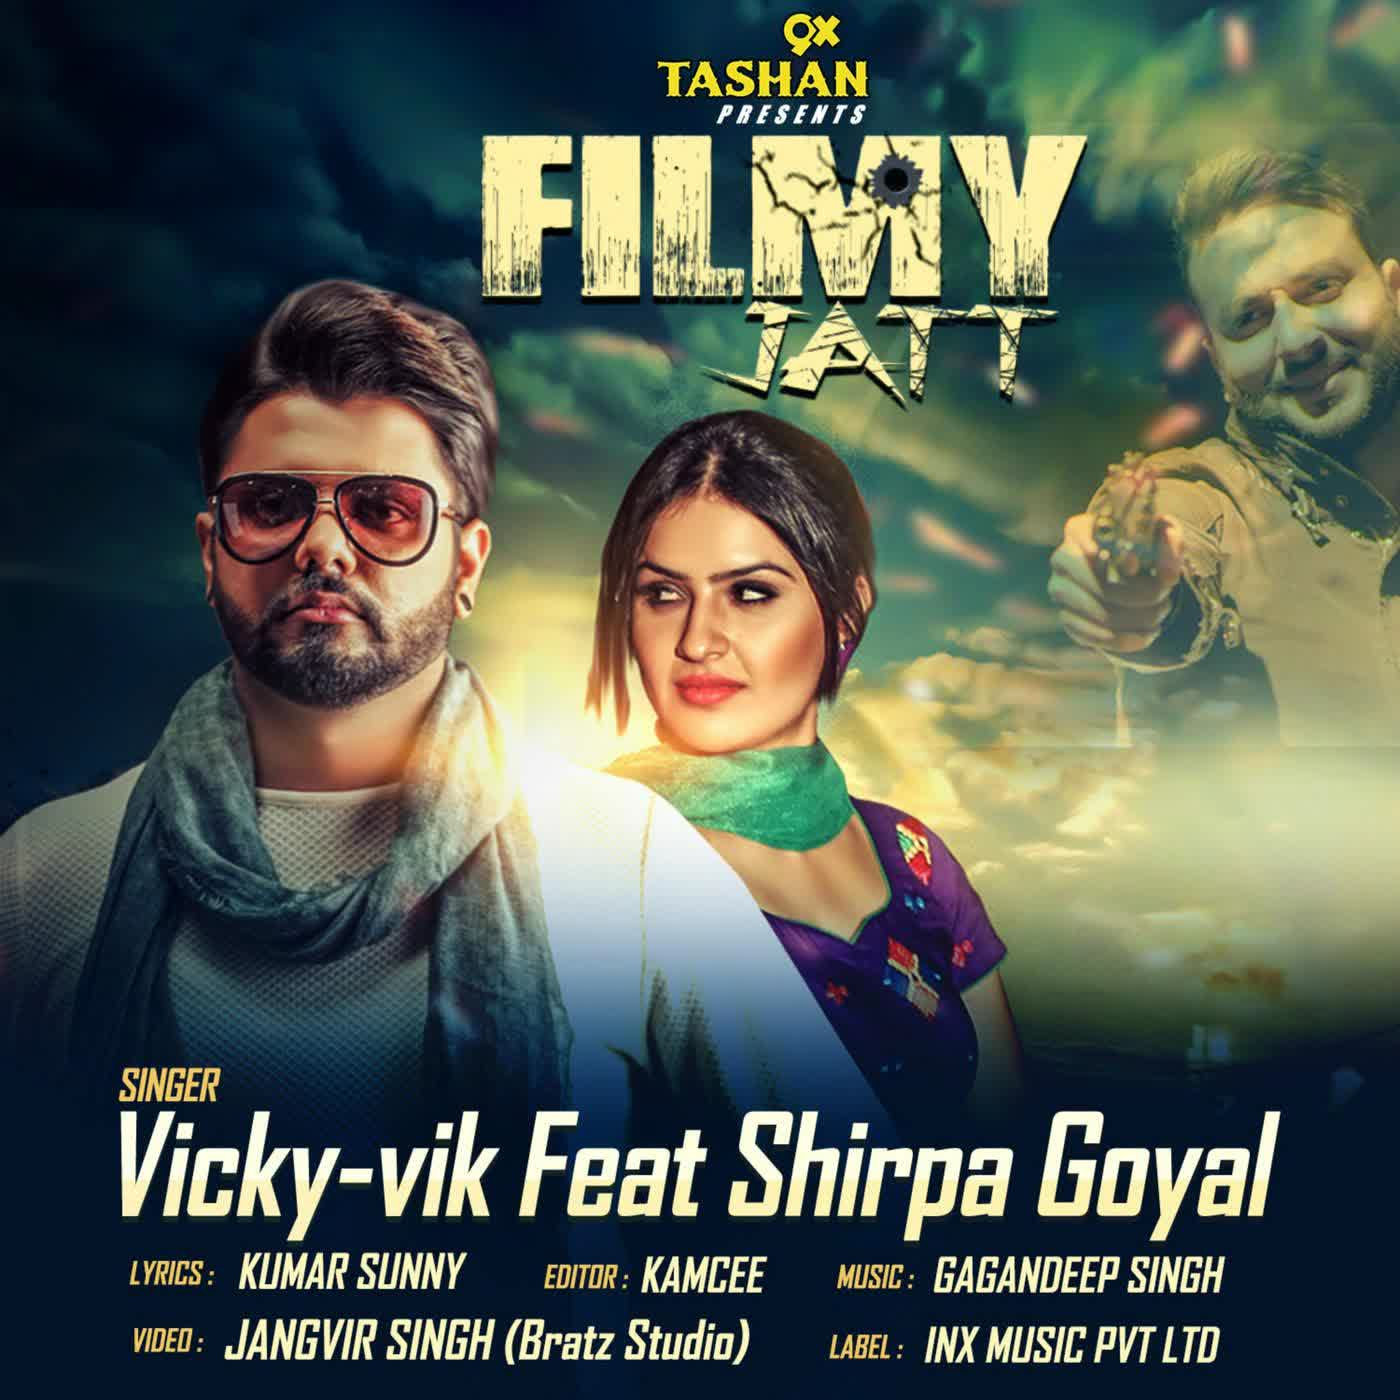 Filmy Jatt Vicky Vik, Shirpa Goyal